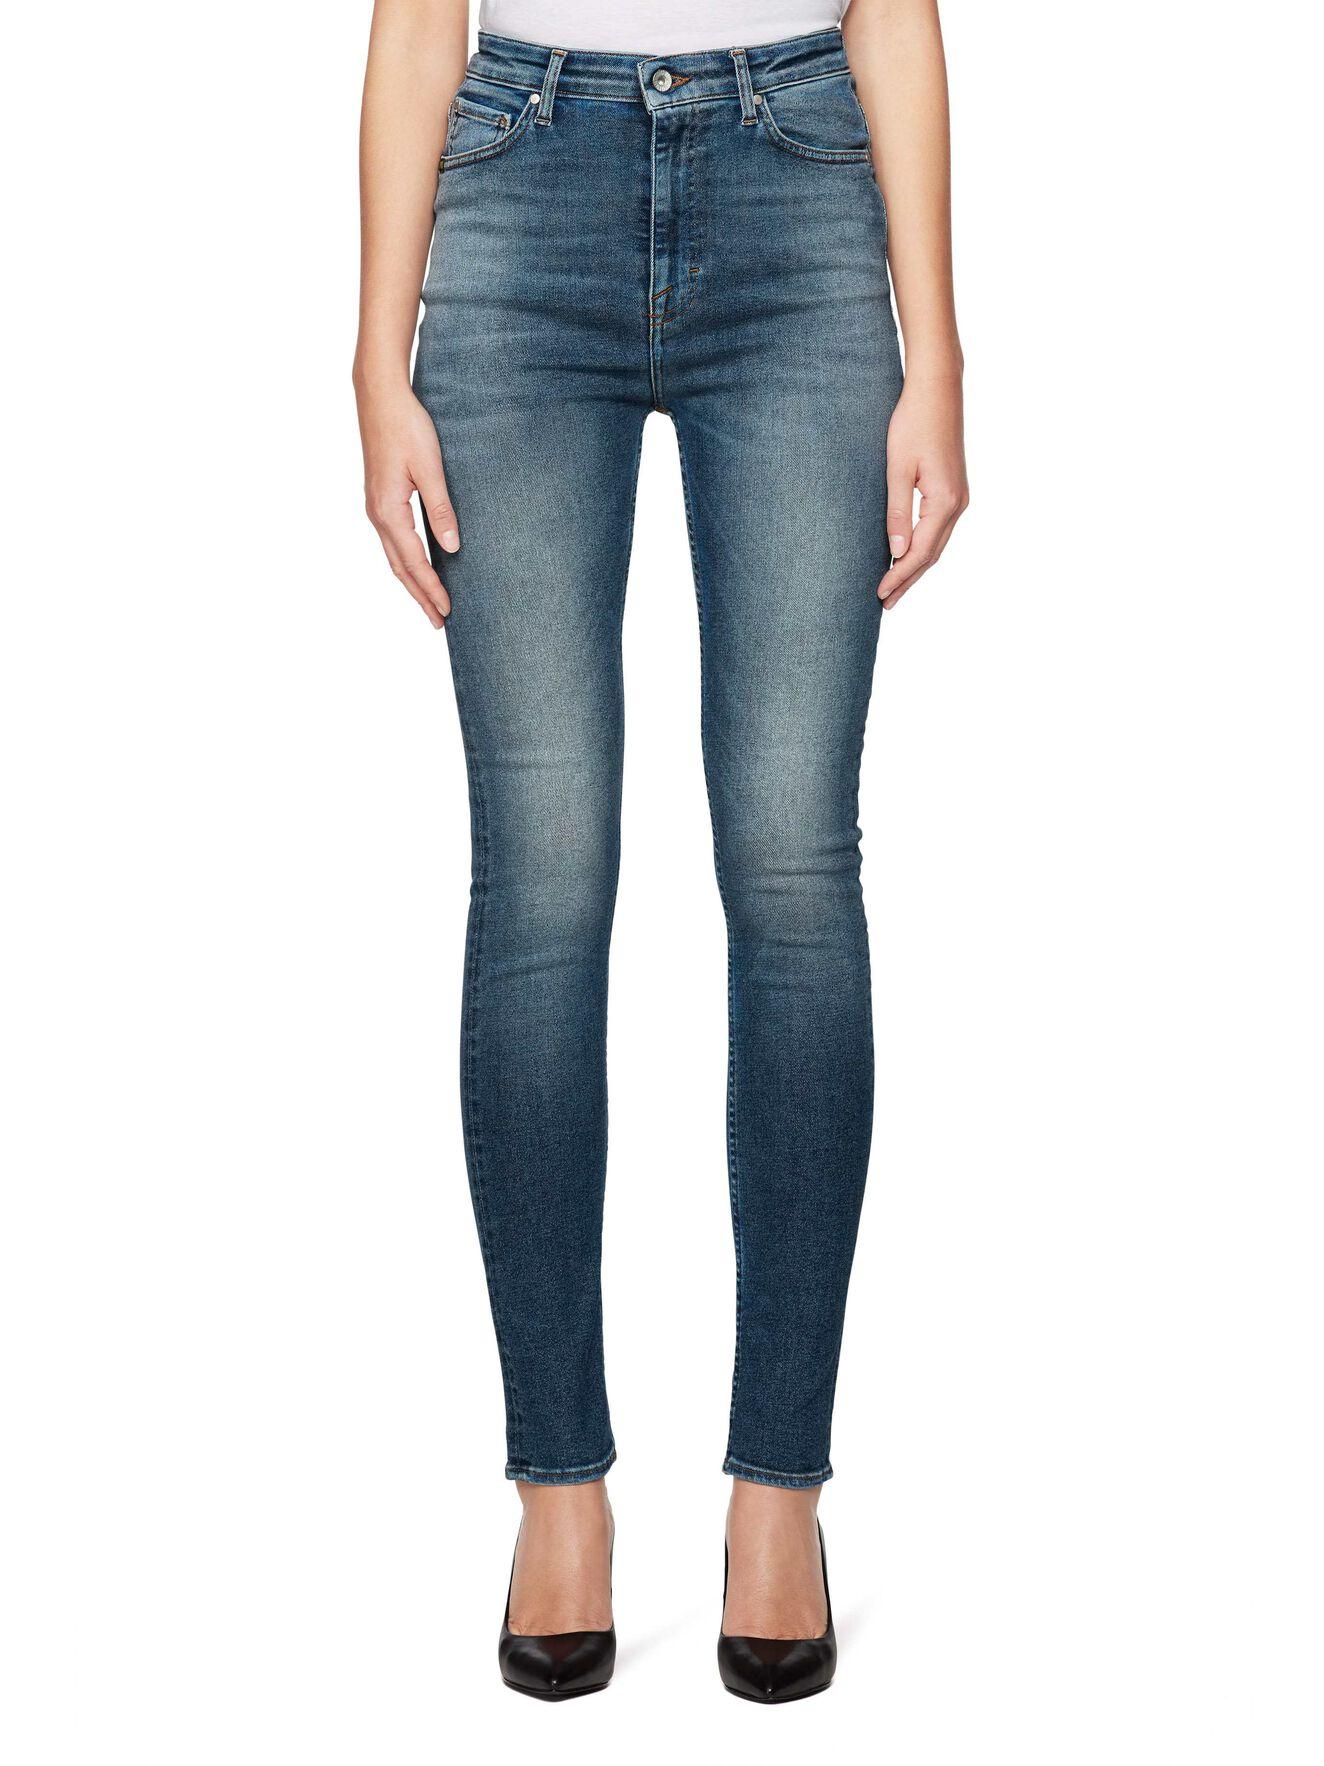 Sandie Jeans in Medium Blue from Tiger of Sweden